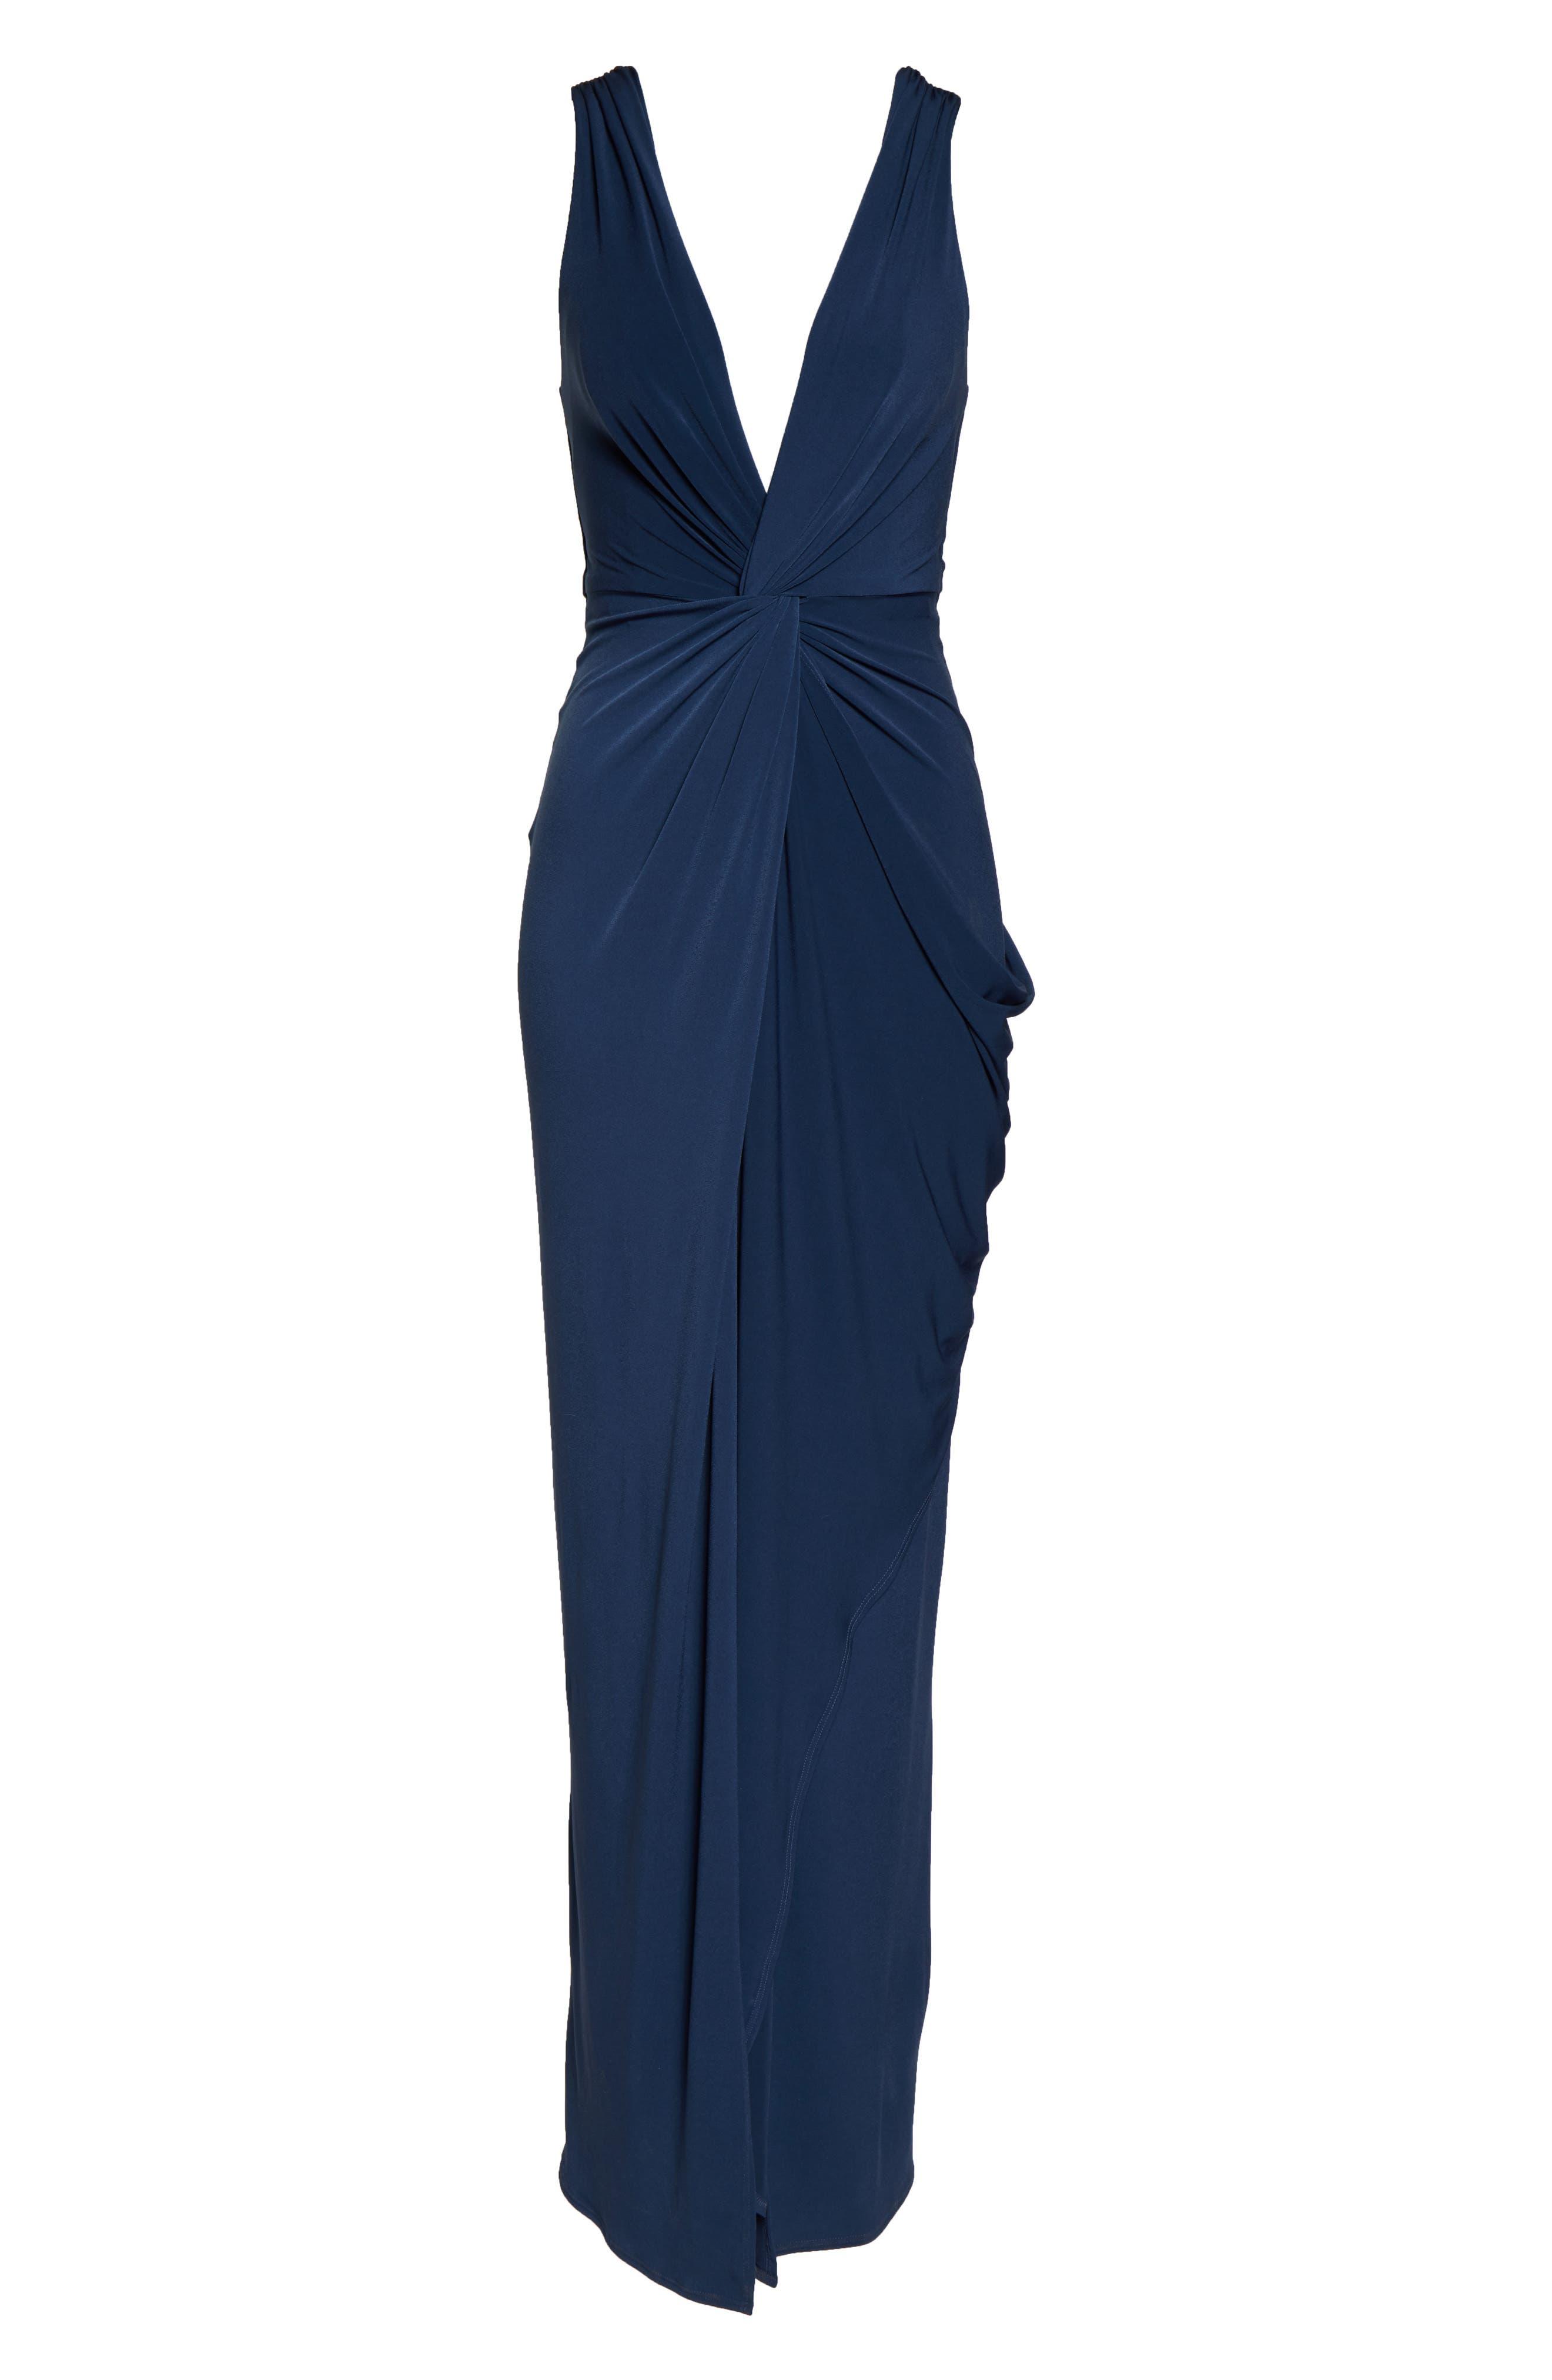 KATIE MAY, Leo Twist Front Evening Dress, Alternate thumbnail 7, color, DEEP SEA